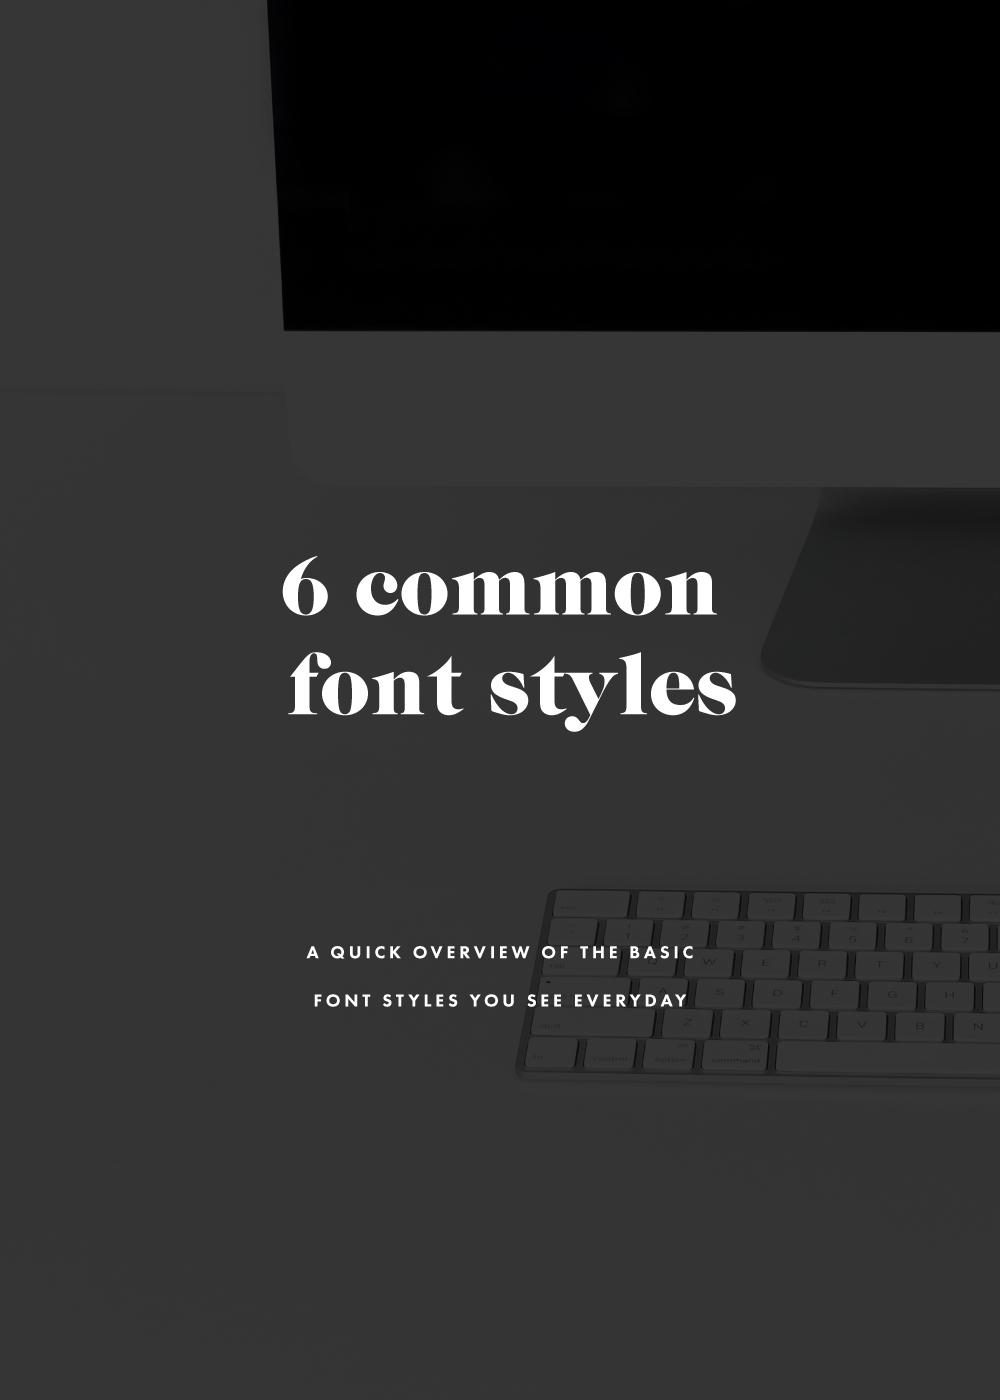 six common font styles